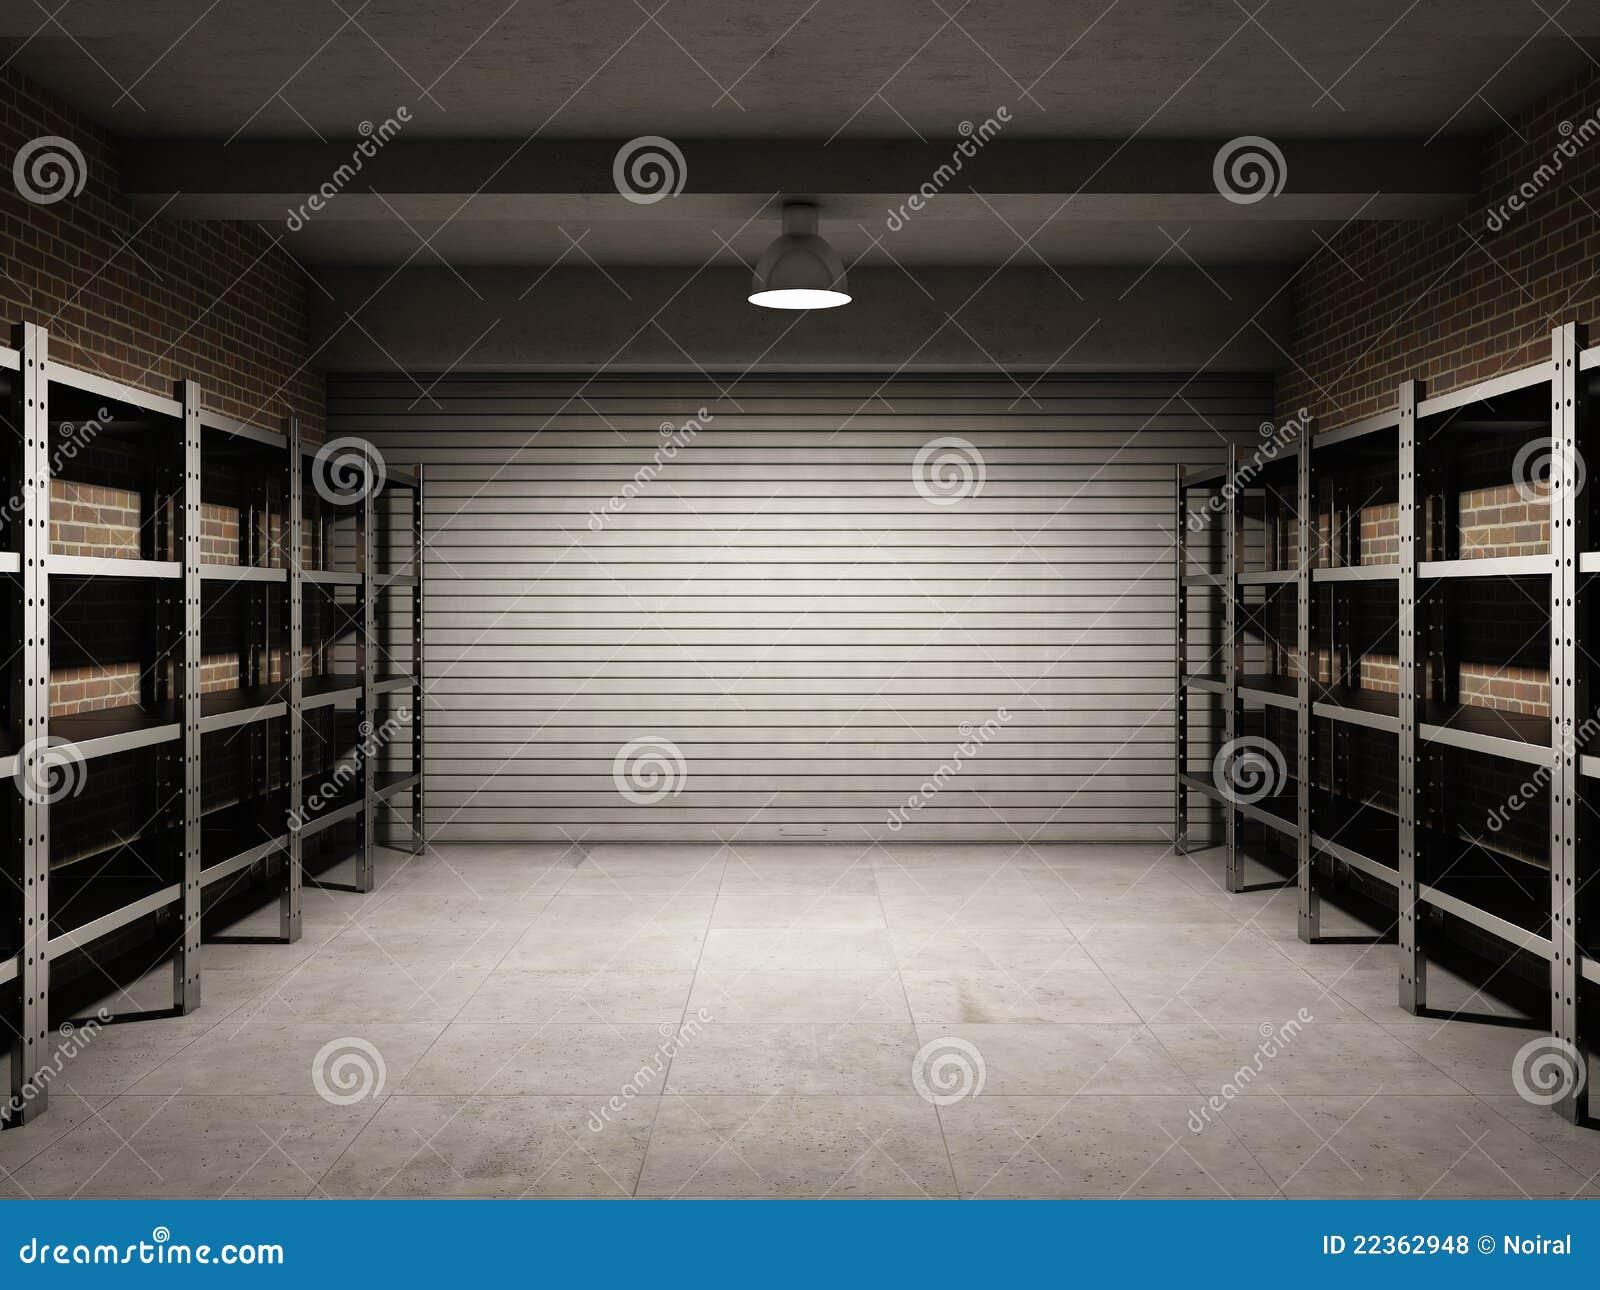 garage room design ideas - Garage Vuoto Fotografie Stock Libere da Diritti Immagine